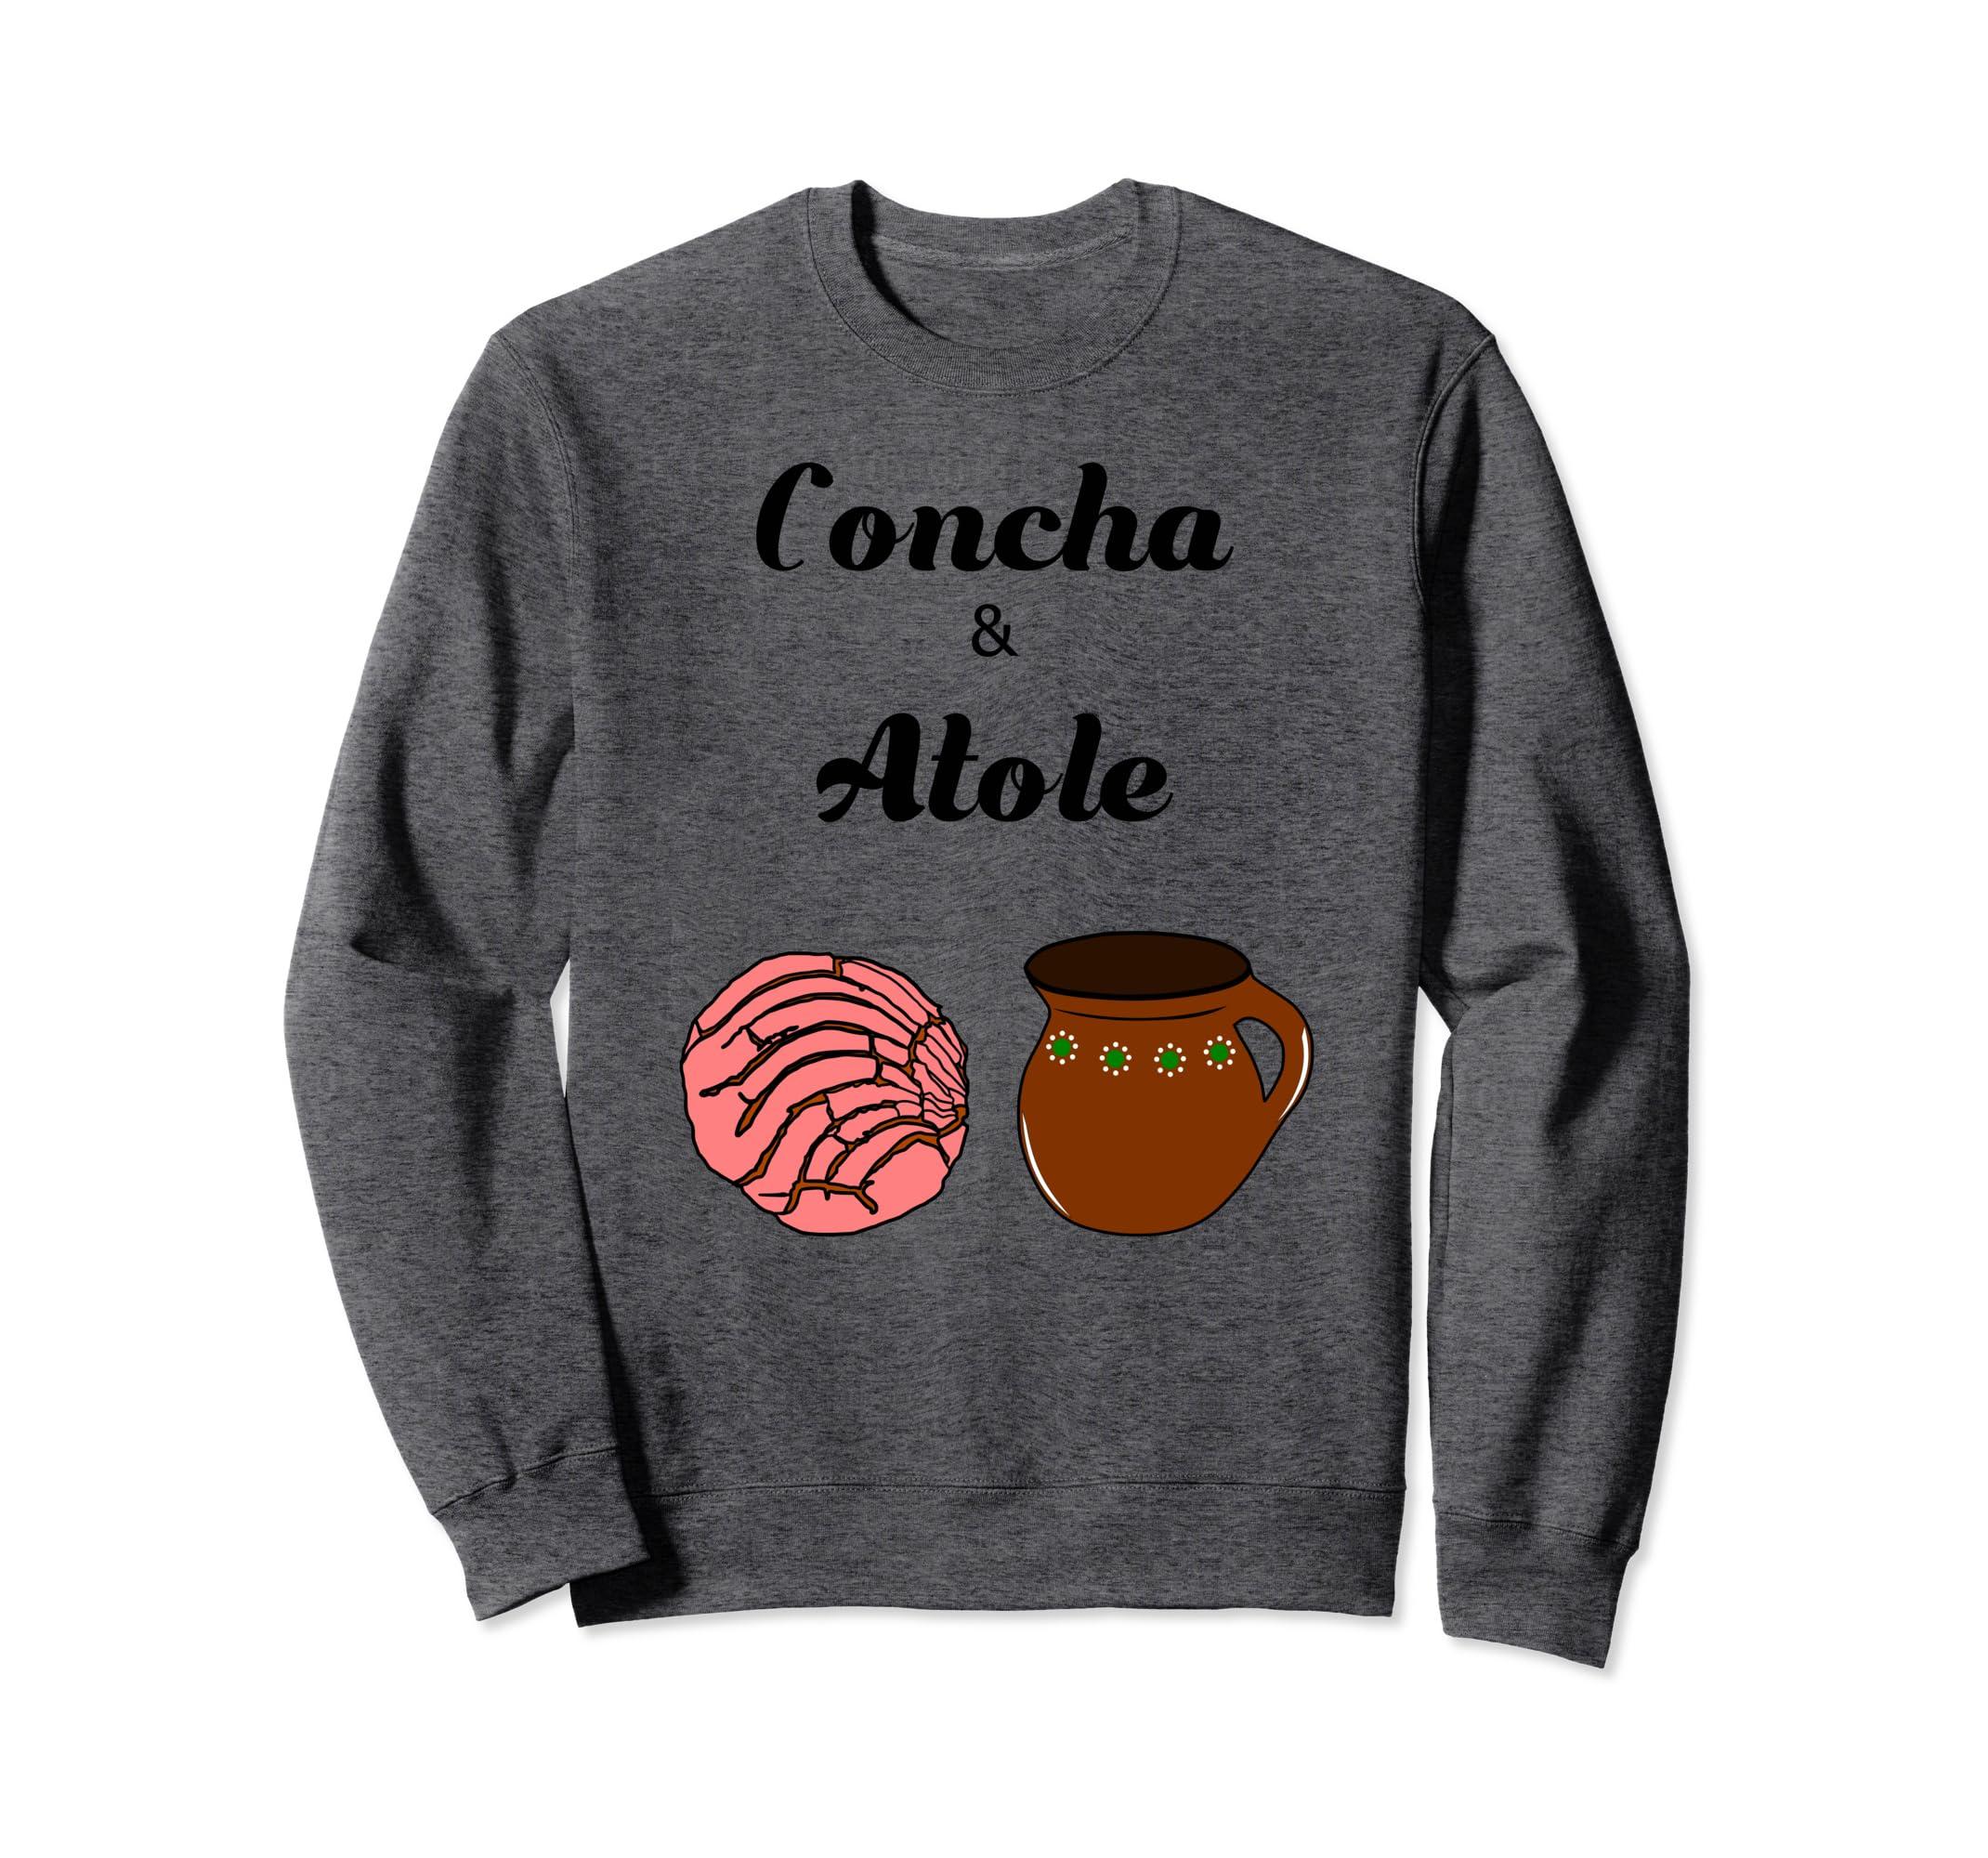 Amazon.com: Concha & Atole Mexican Bread Beverage Pan Dulce Sweater: Clothing